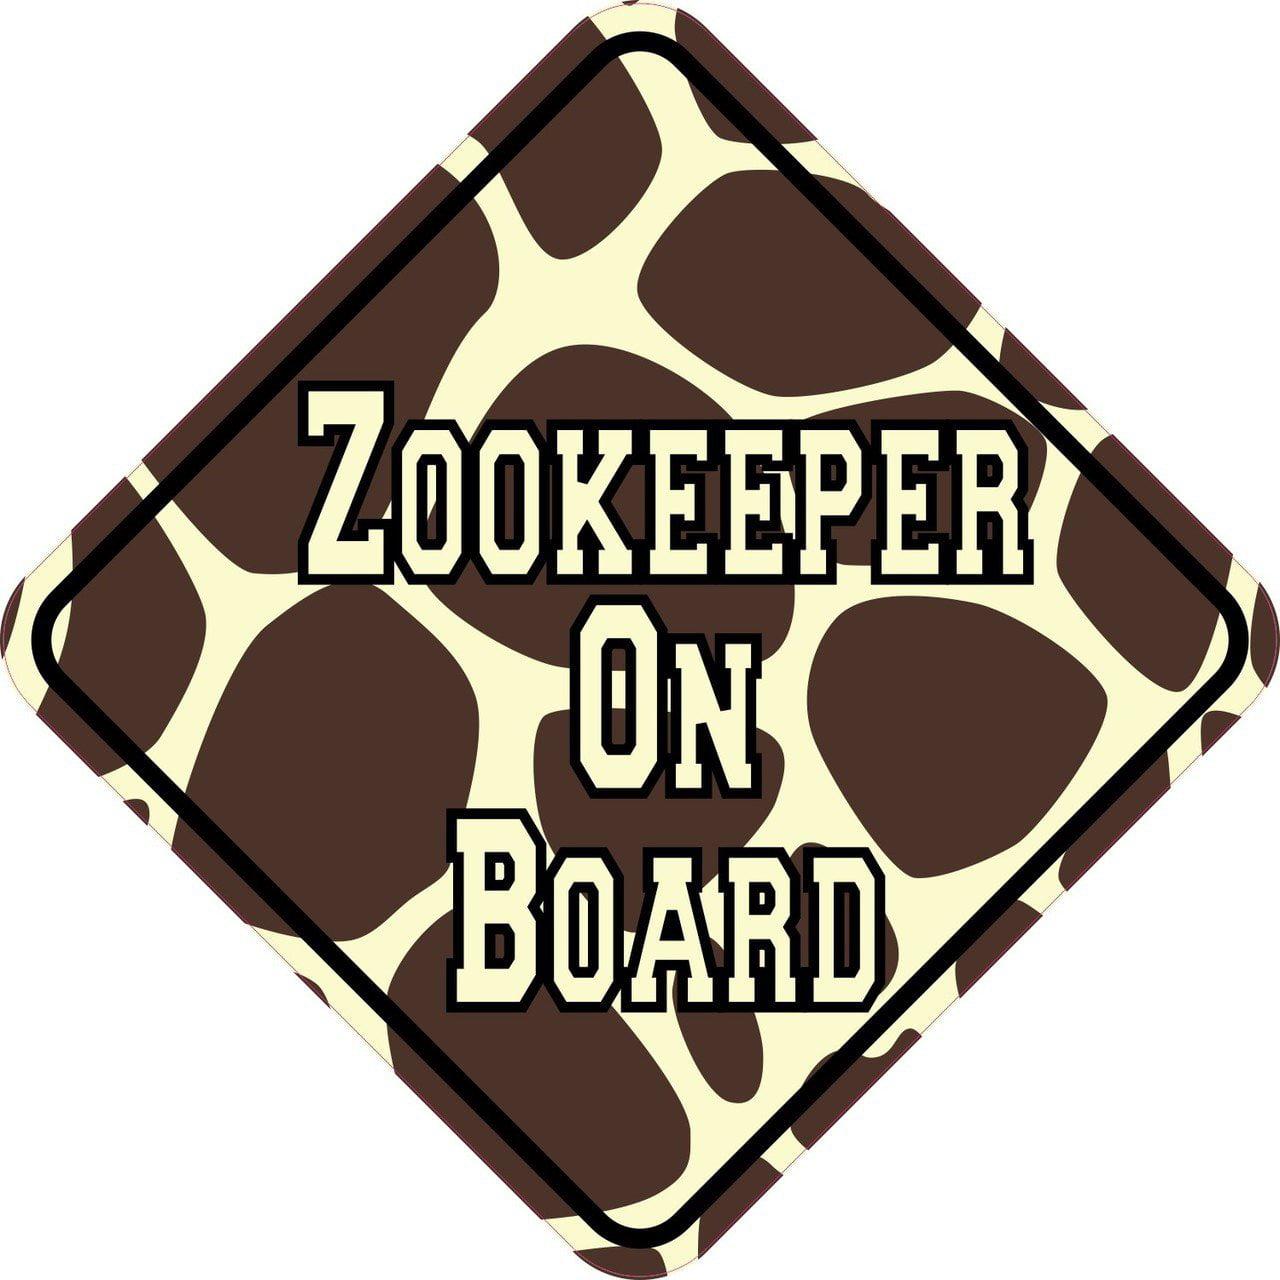 5x5 zookeeper on board bumper stickers vinyl decals window